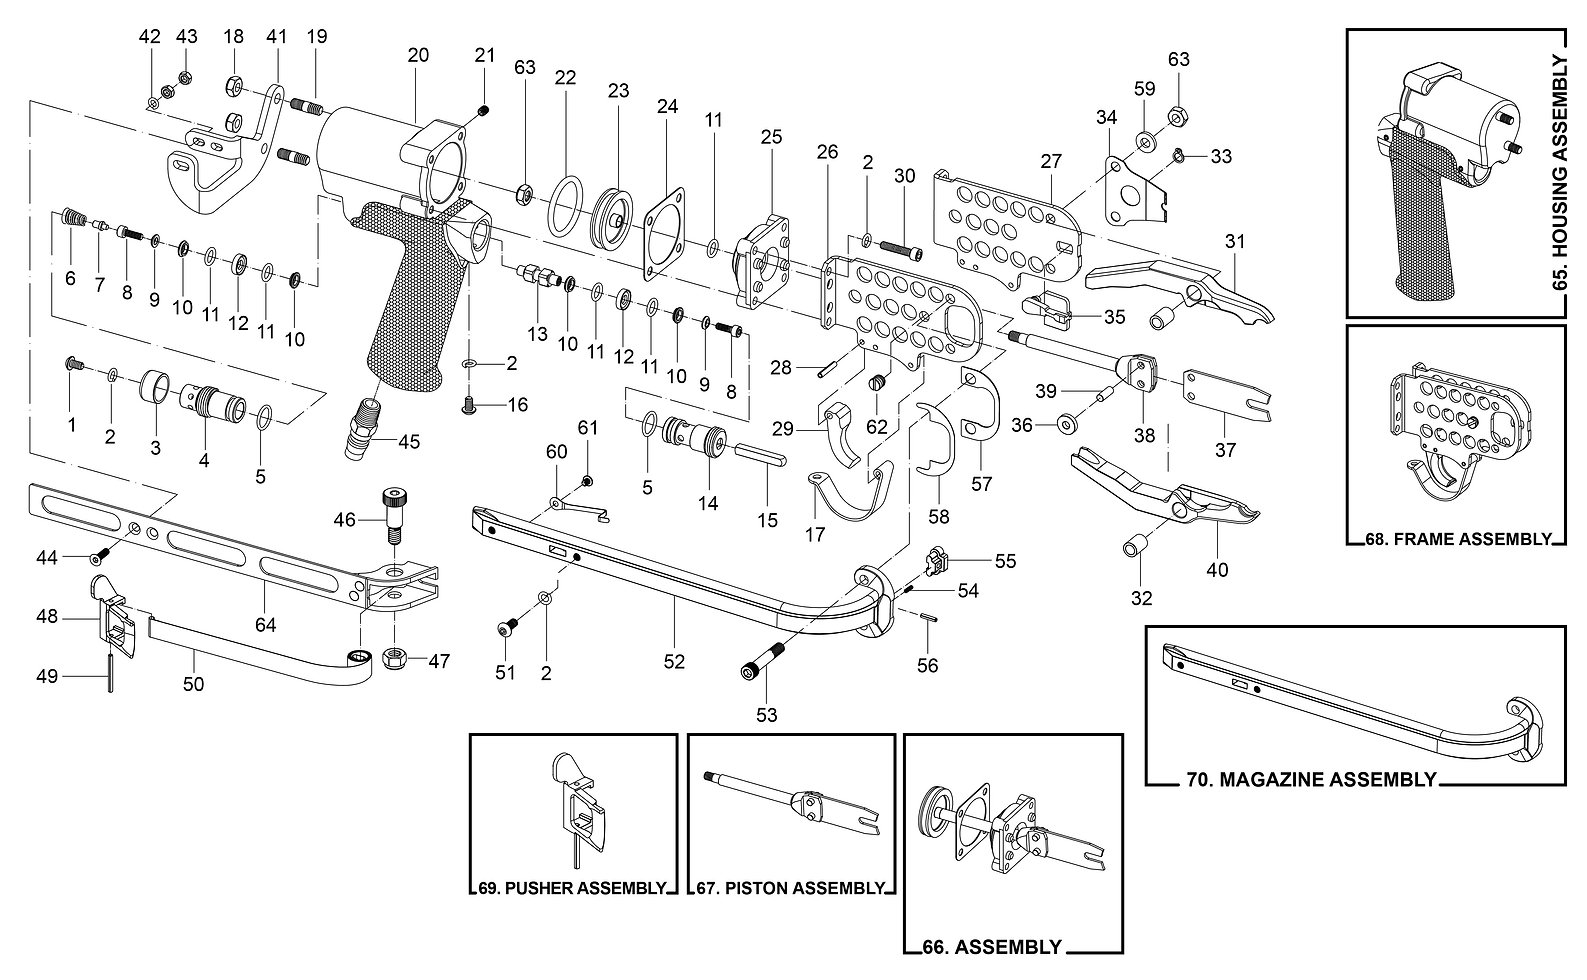 Diagrama Herramienta TO070-01.jpg